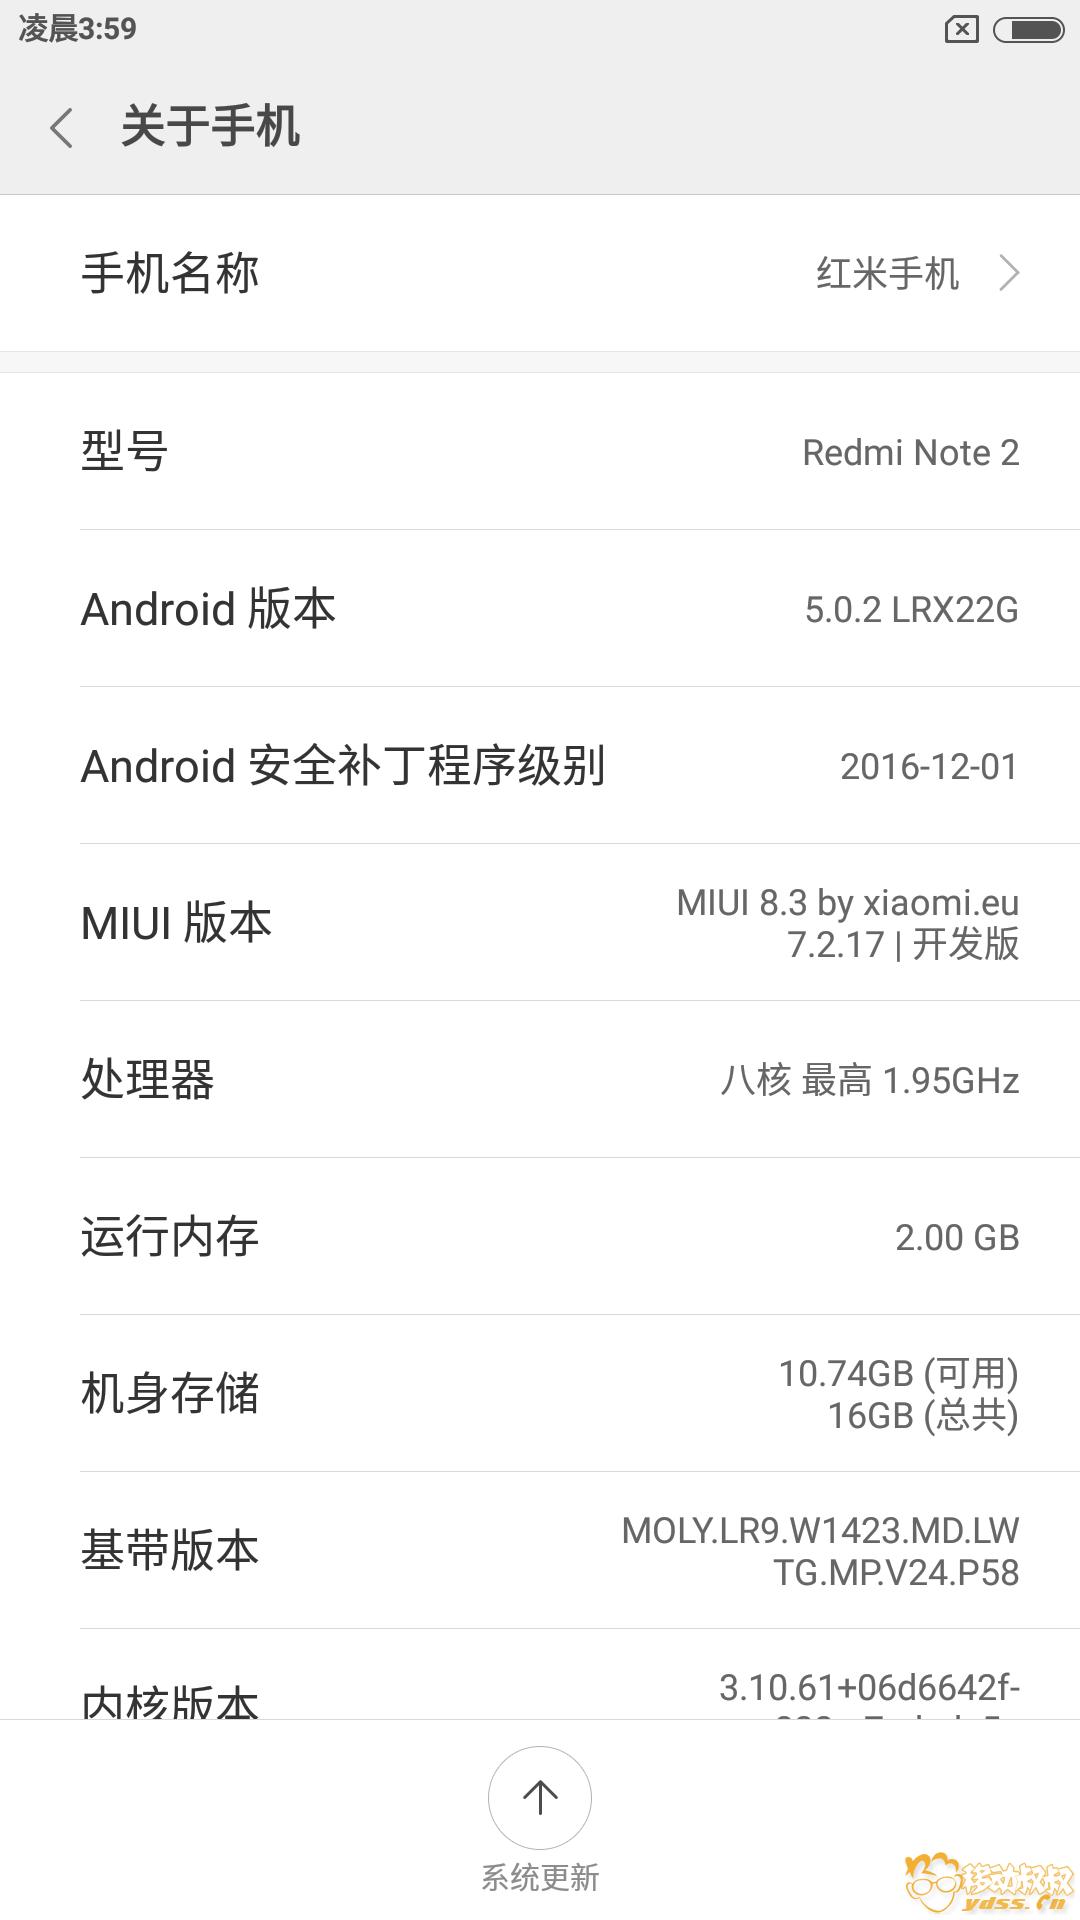 Screenshot_2015-01-01-03-59-19-634_com.android.settings.png